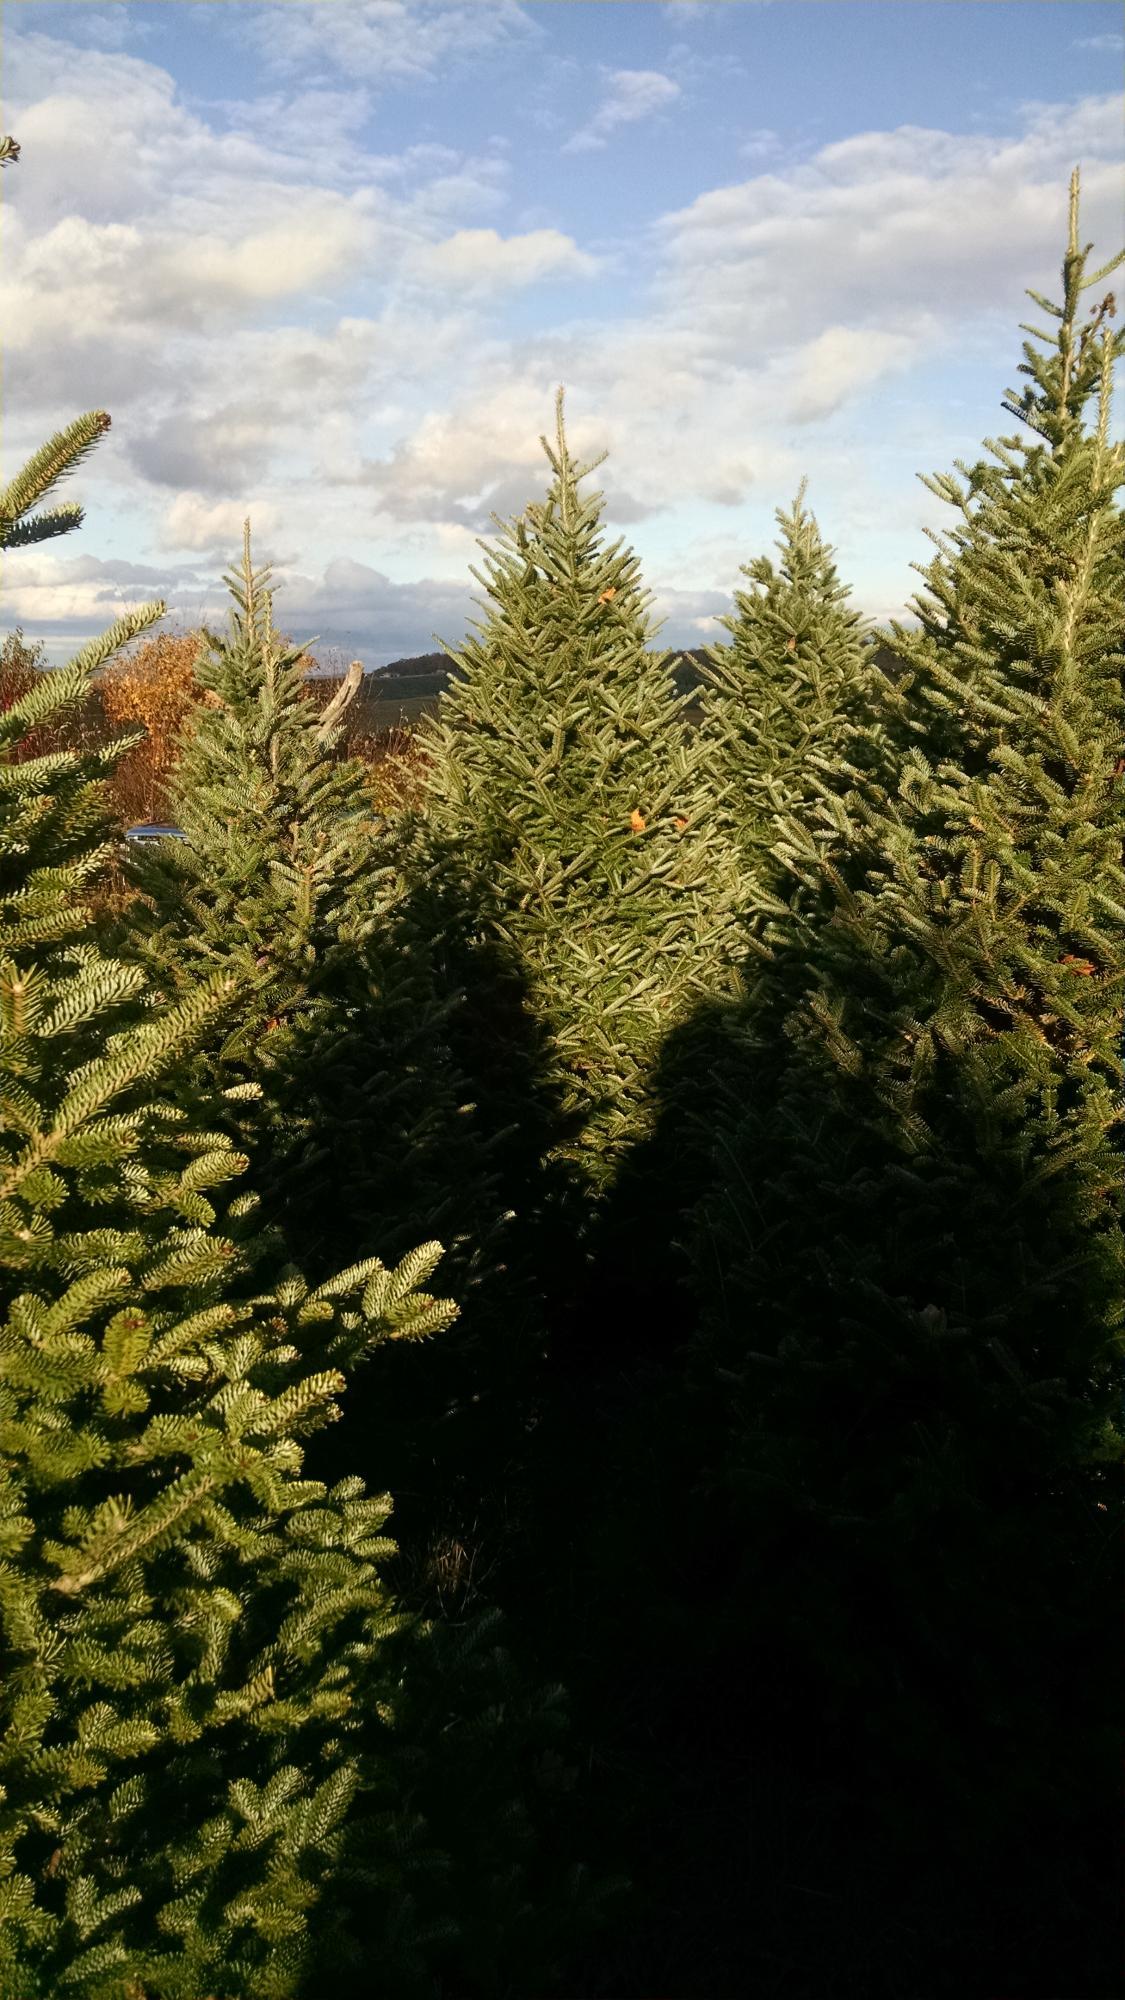 wholesale christmas trees pa - Christmas Trees Wholesale